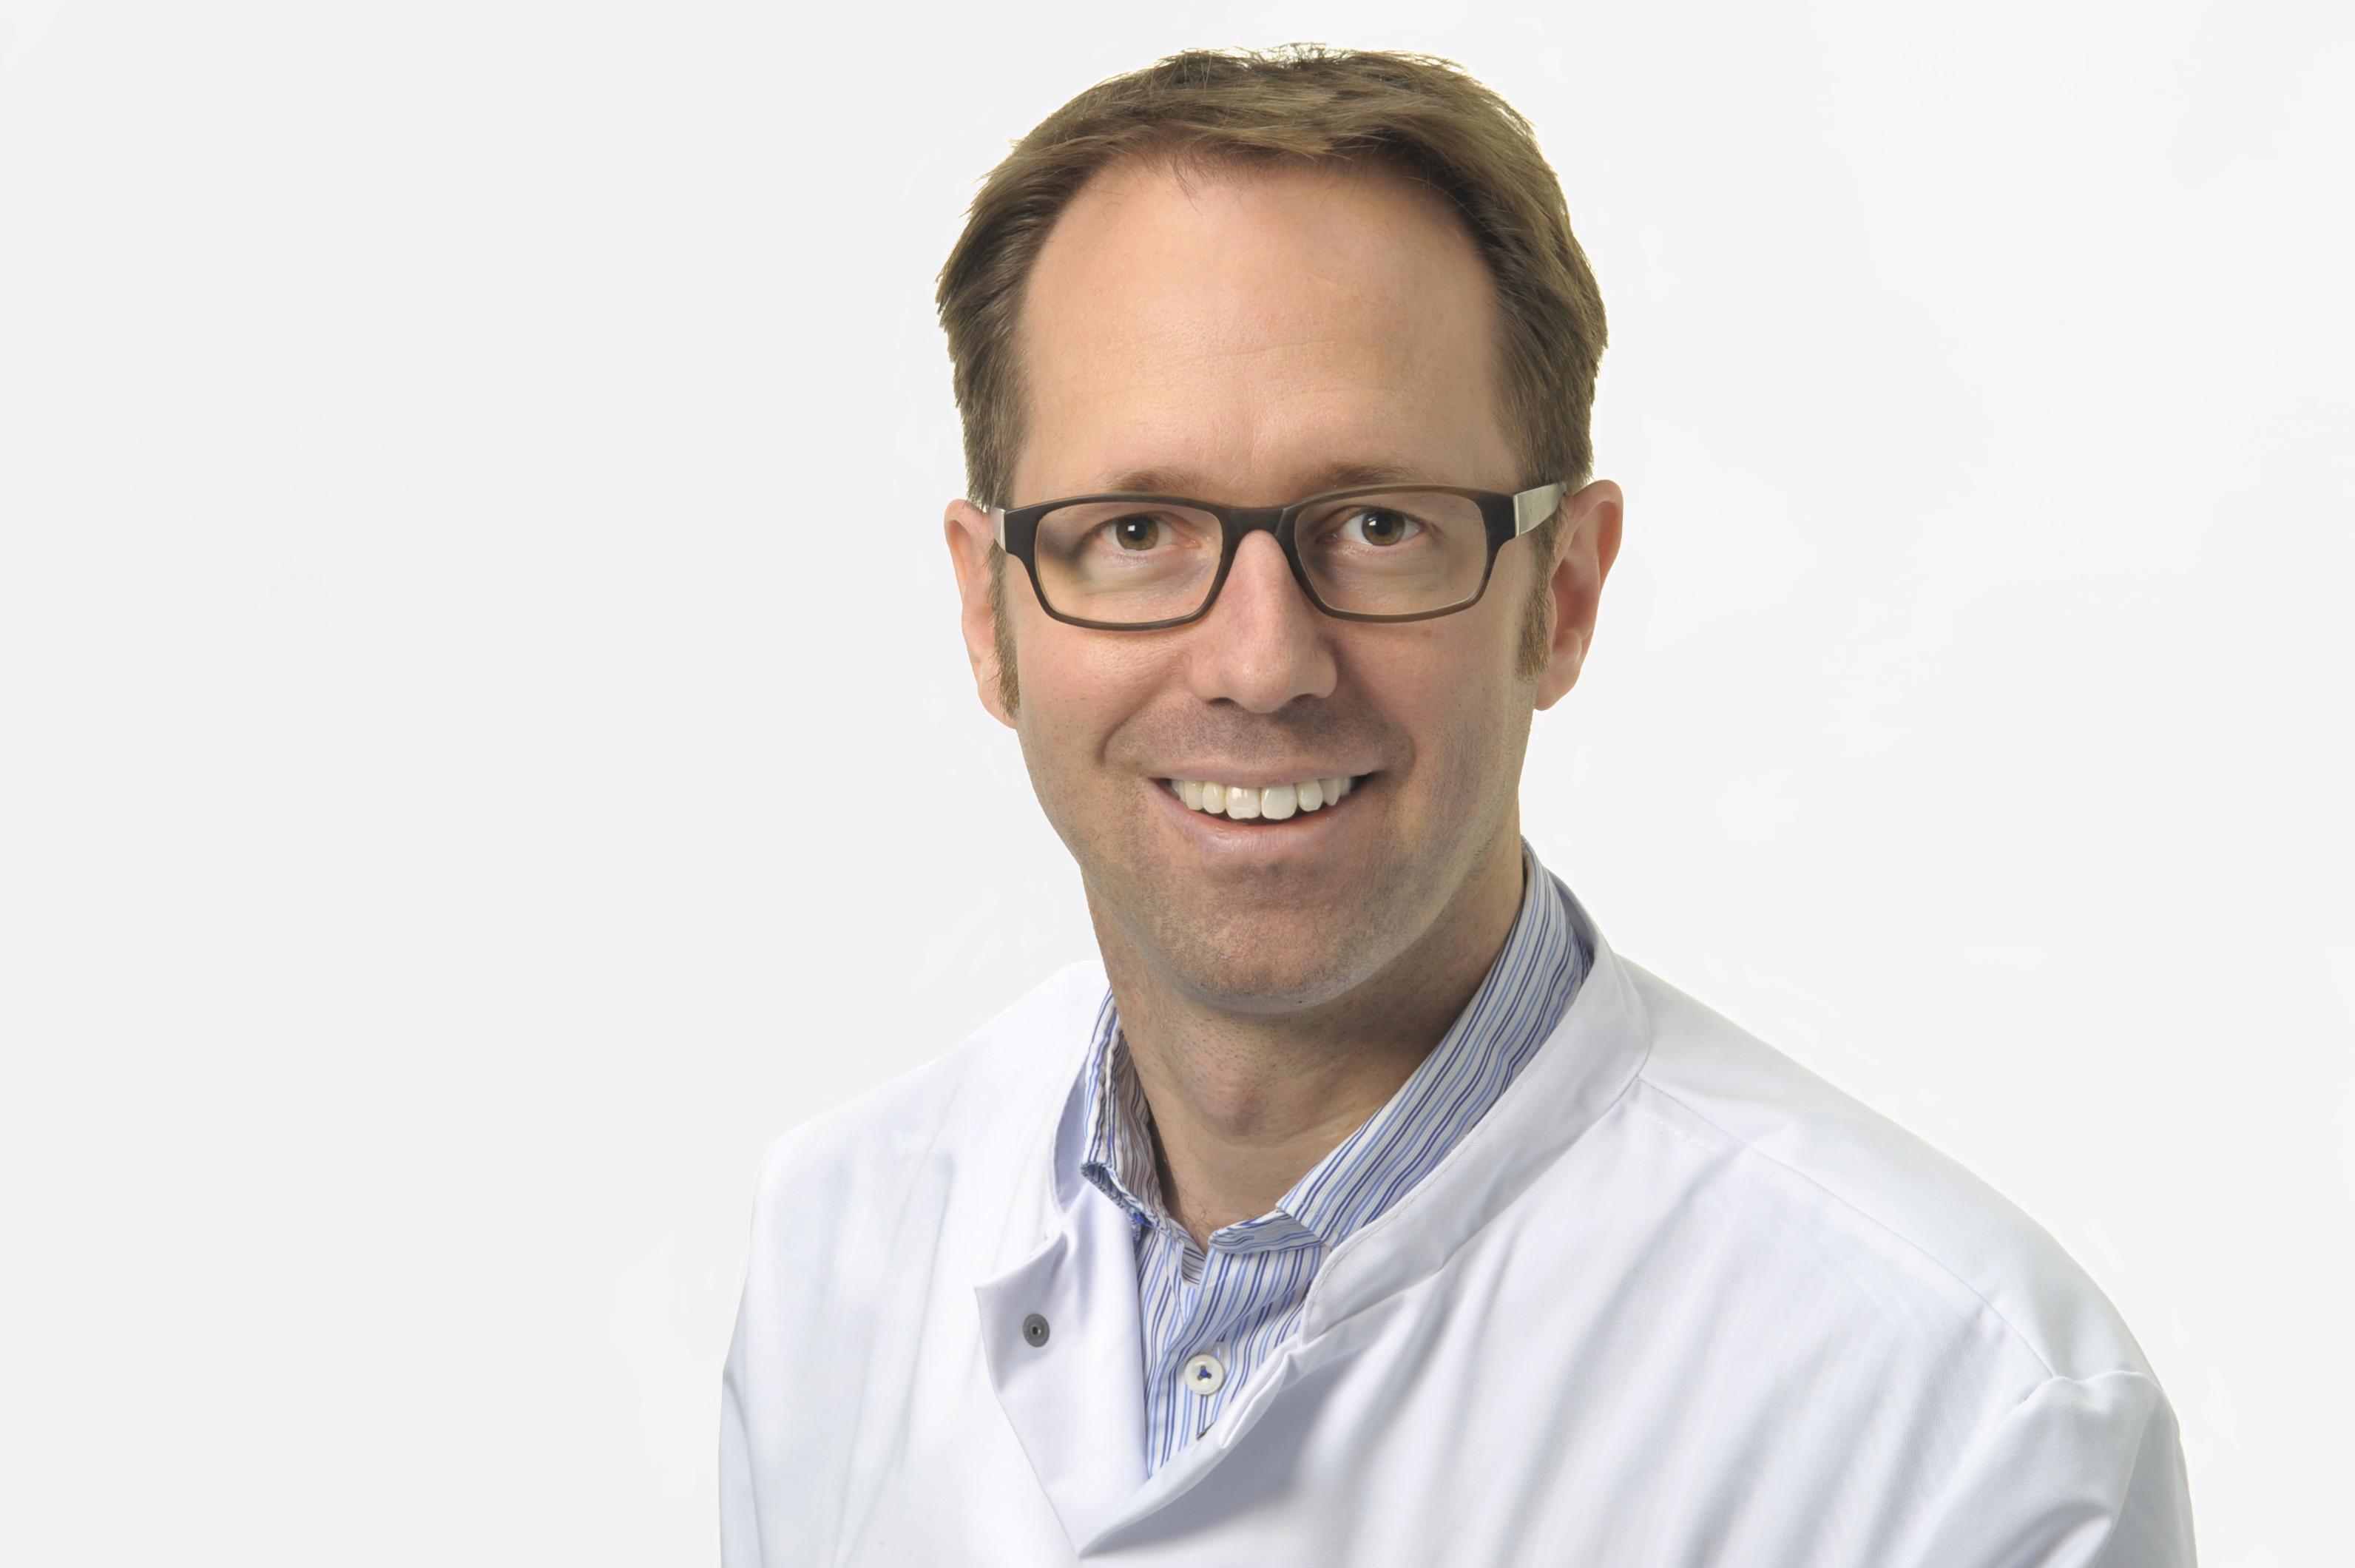 PD Dr. Weber